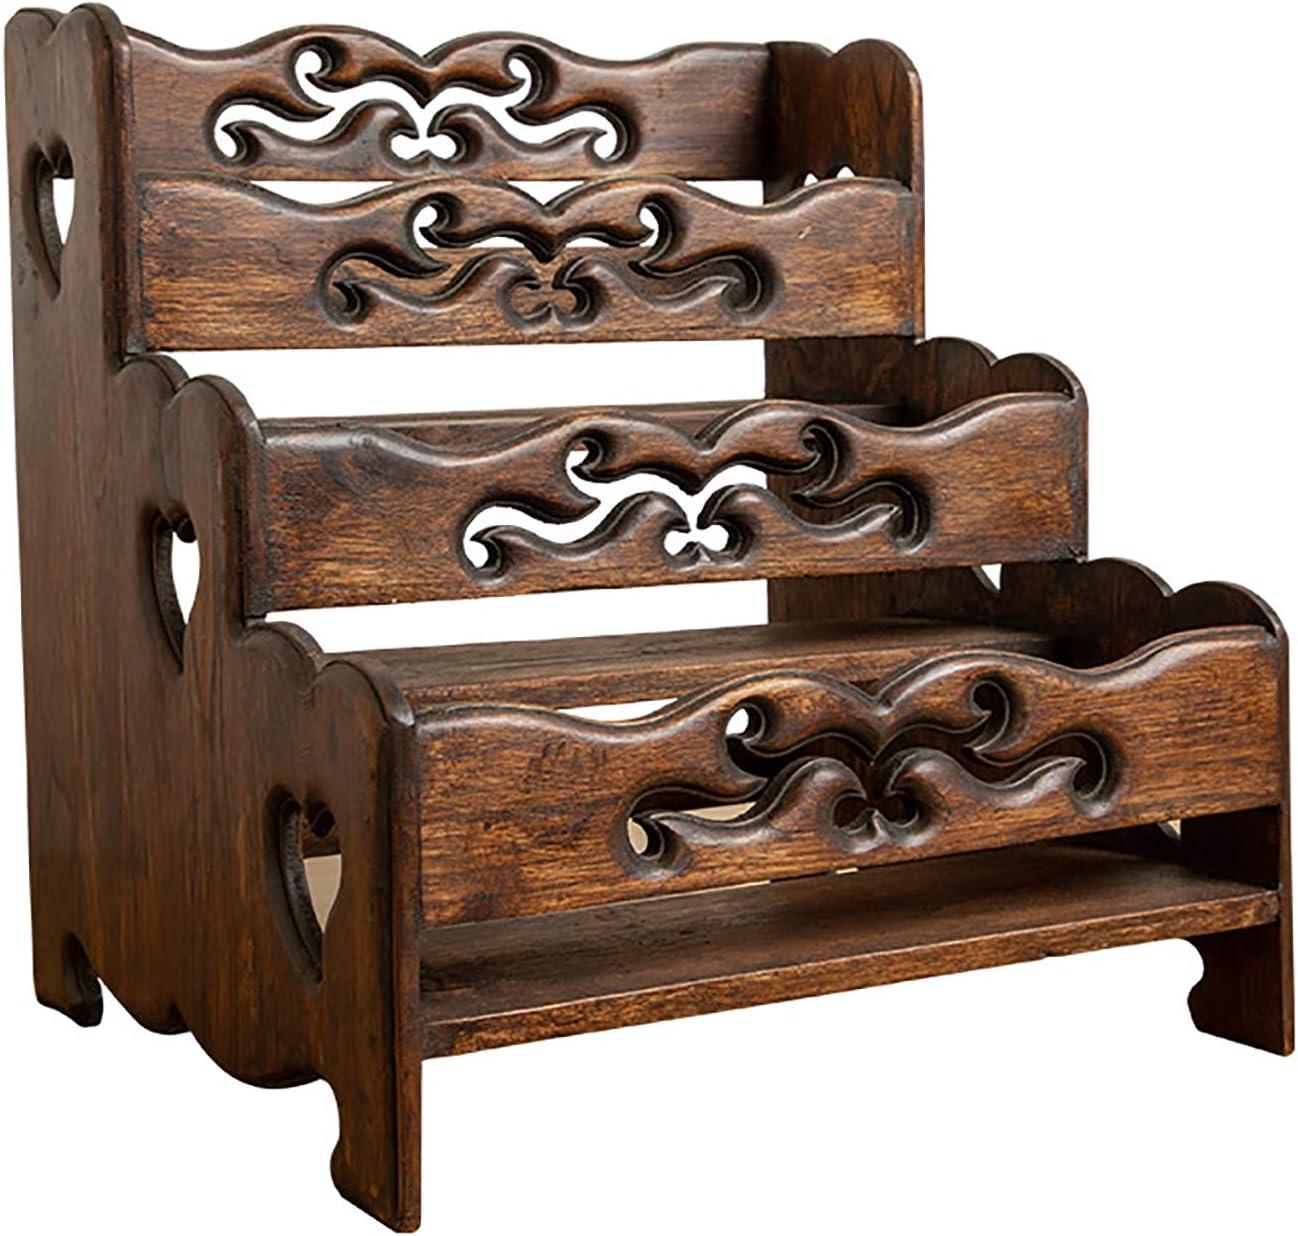 MEVIDA Retro Wood San Francisco Mall Spice Rack Shelf Wooden Organizer Overseas parallel import regular item Seasonin for